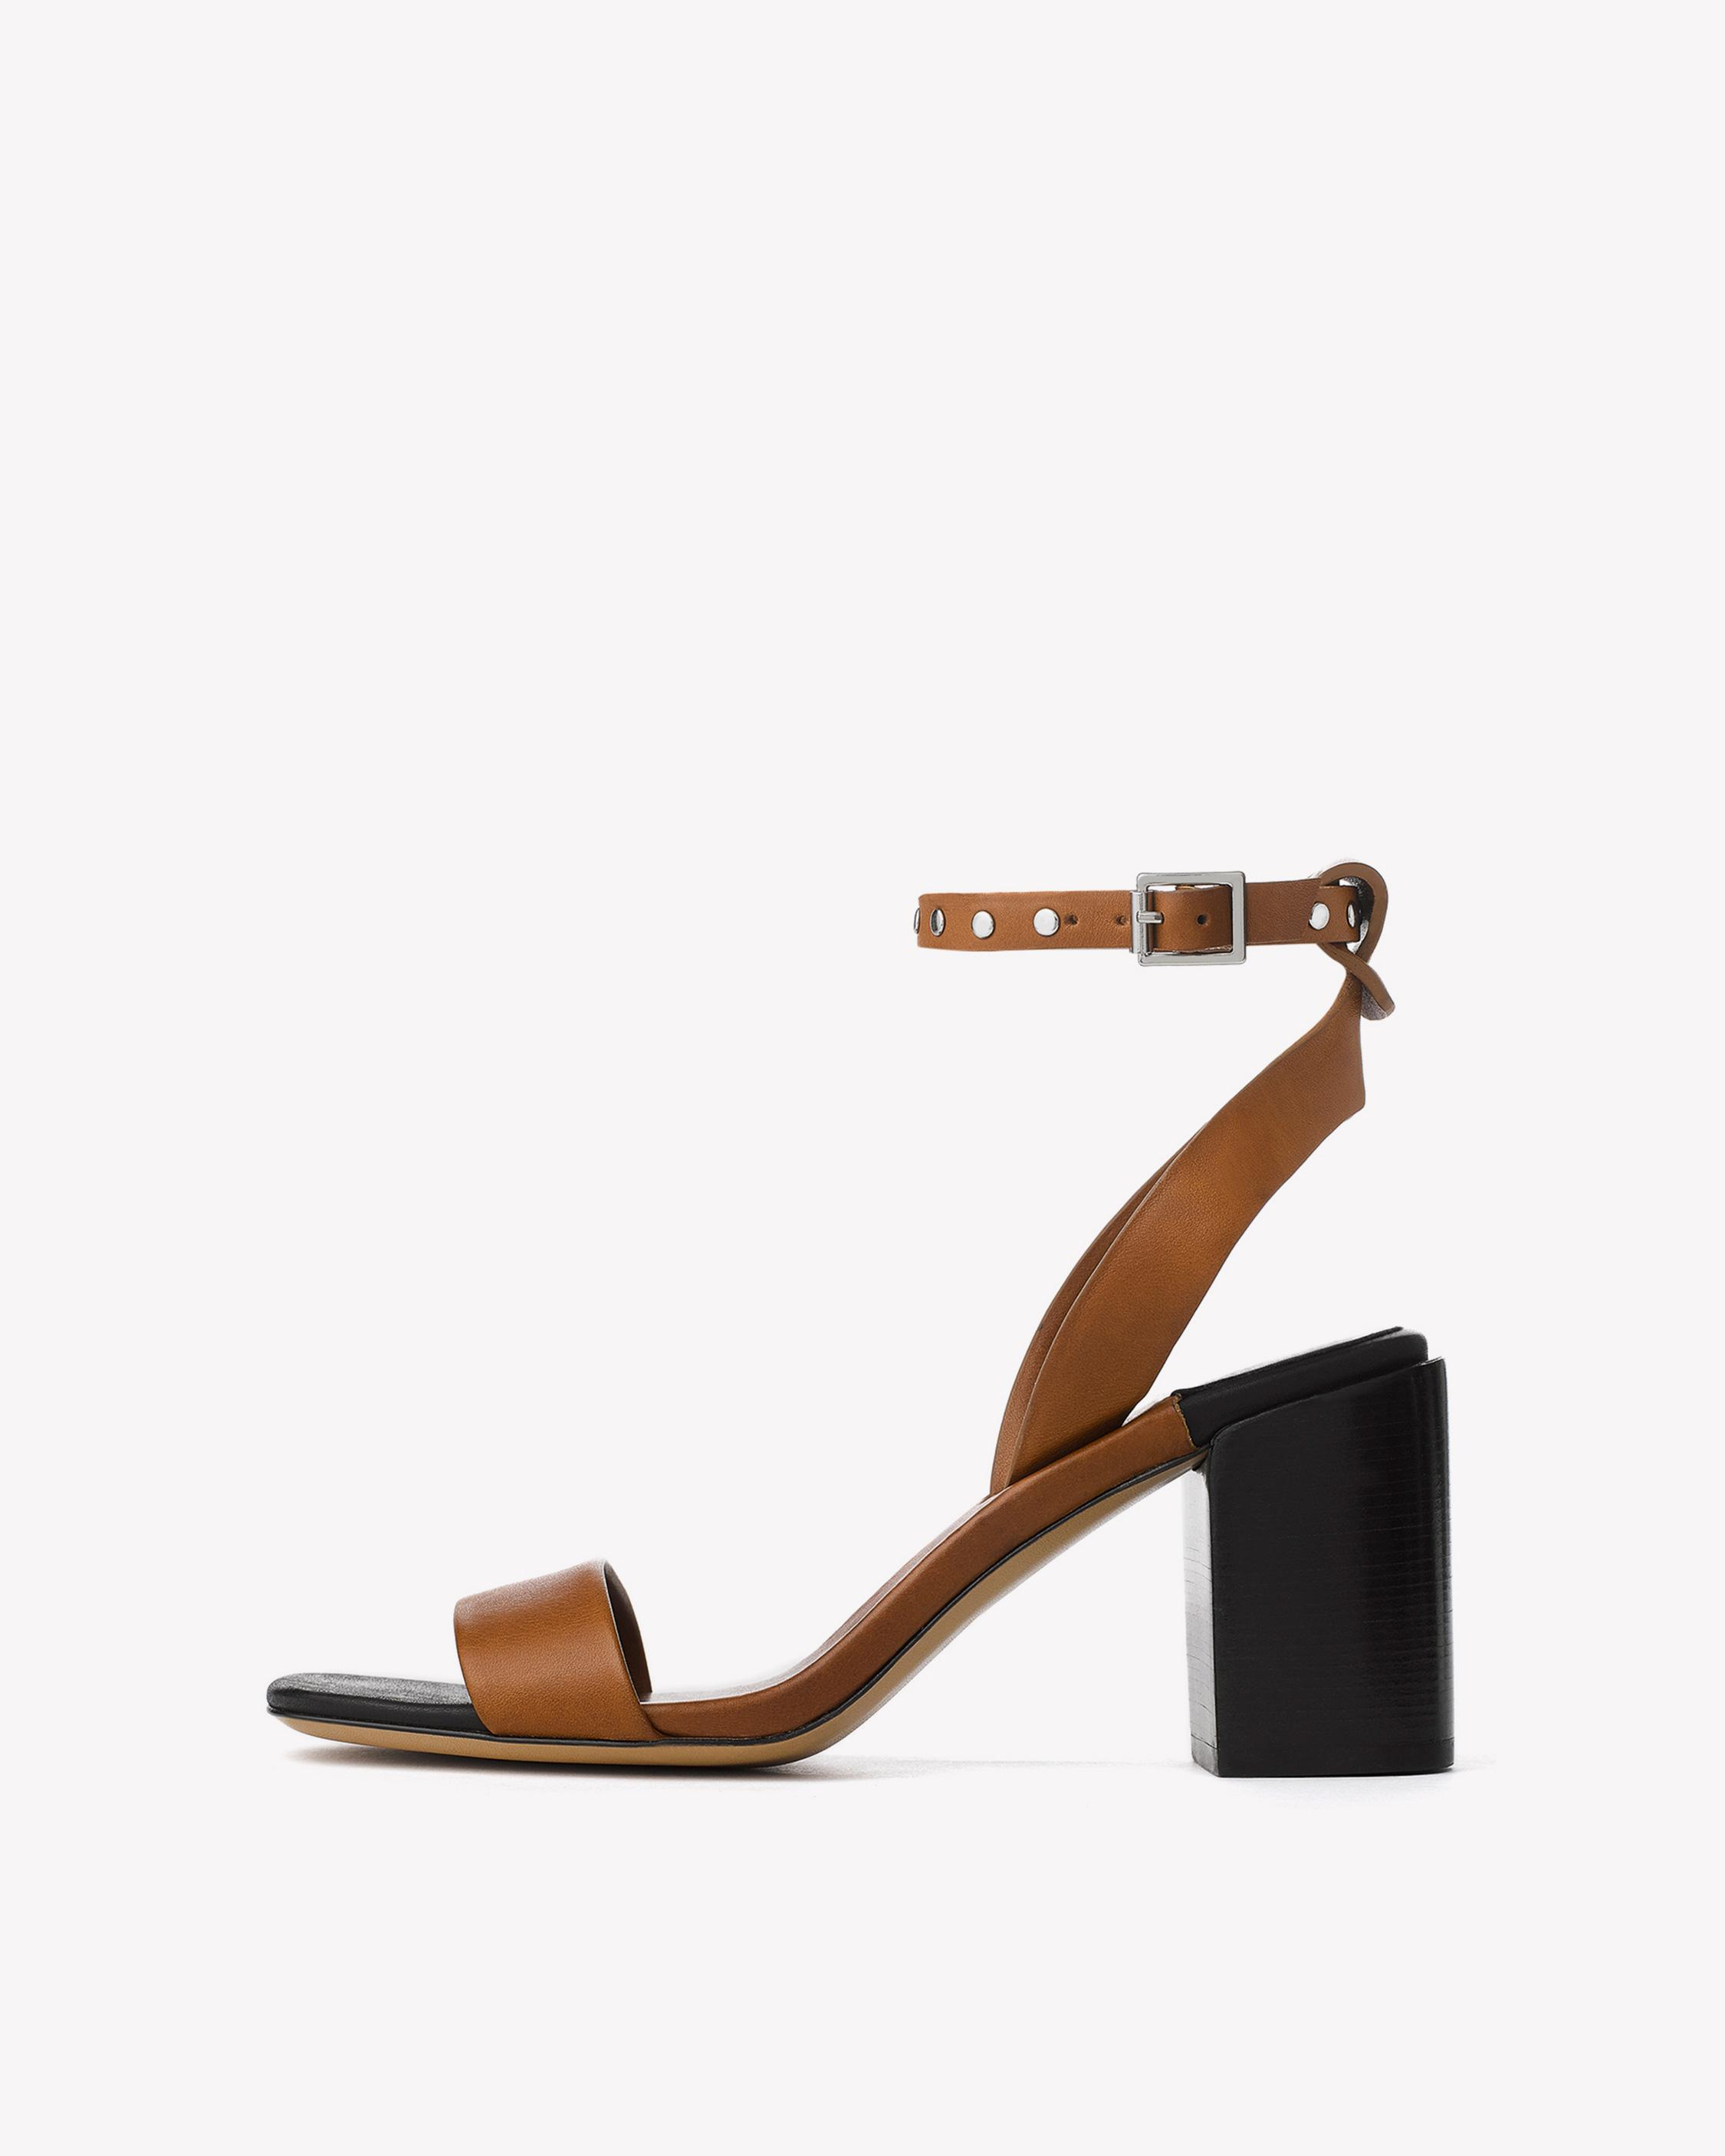 RAG&BONE Woman Leather Sandals Size 35 S7g6N77